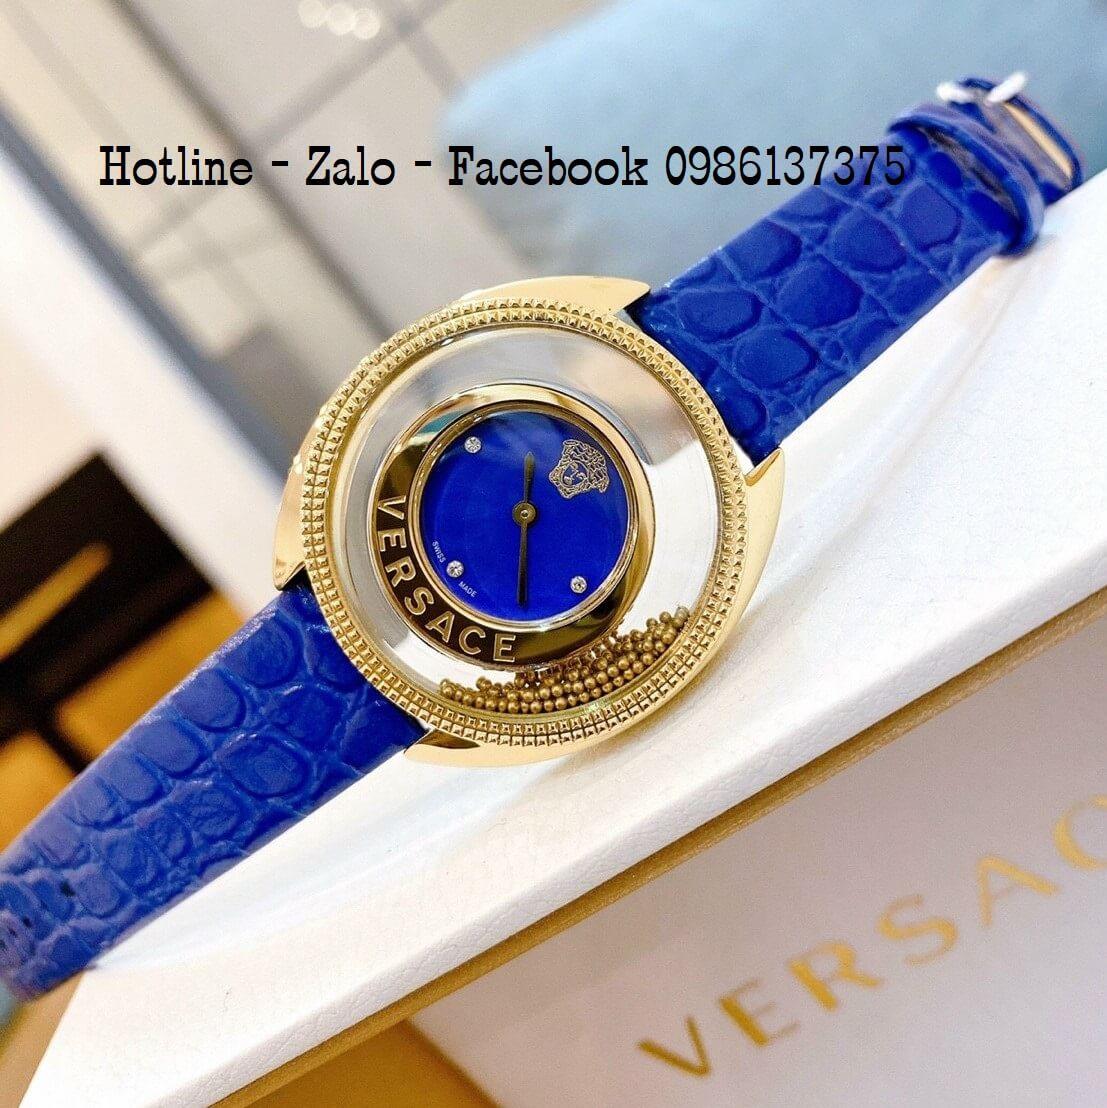 Đồng Hồ Nữ Versace Destiny Oval Dây Da Xanh Blue 37mm